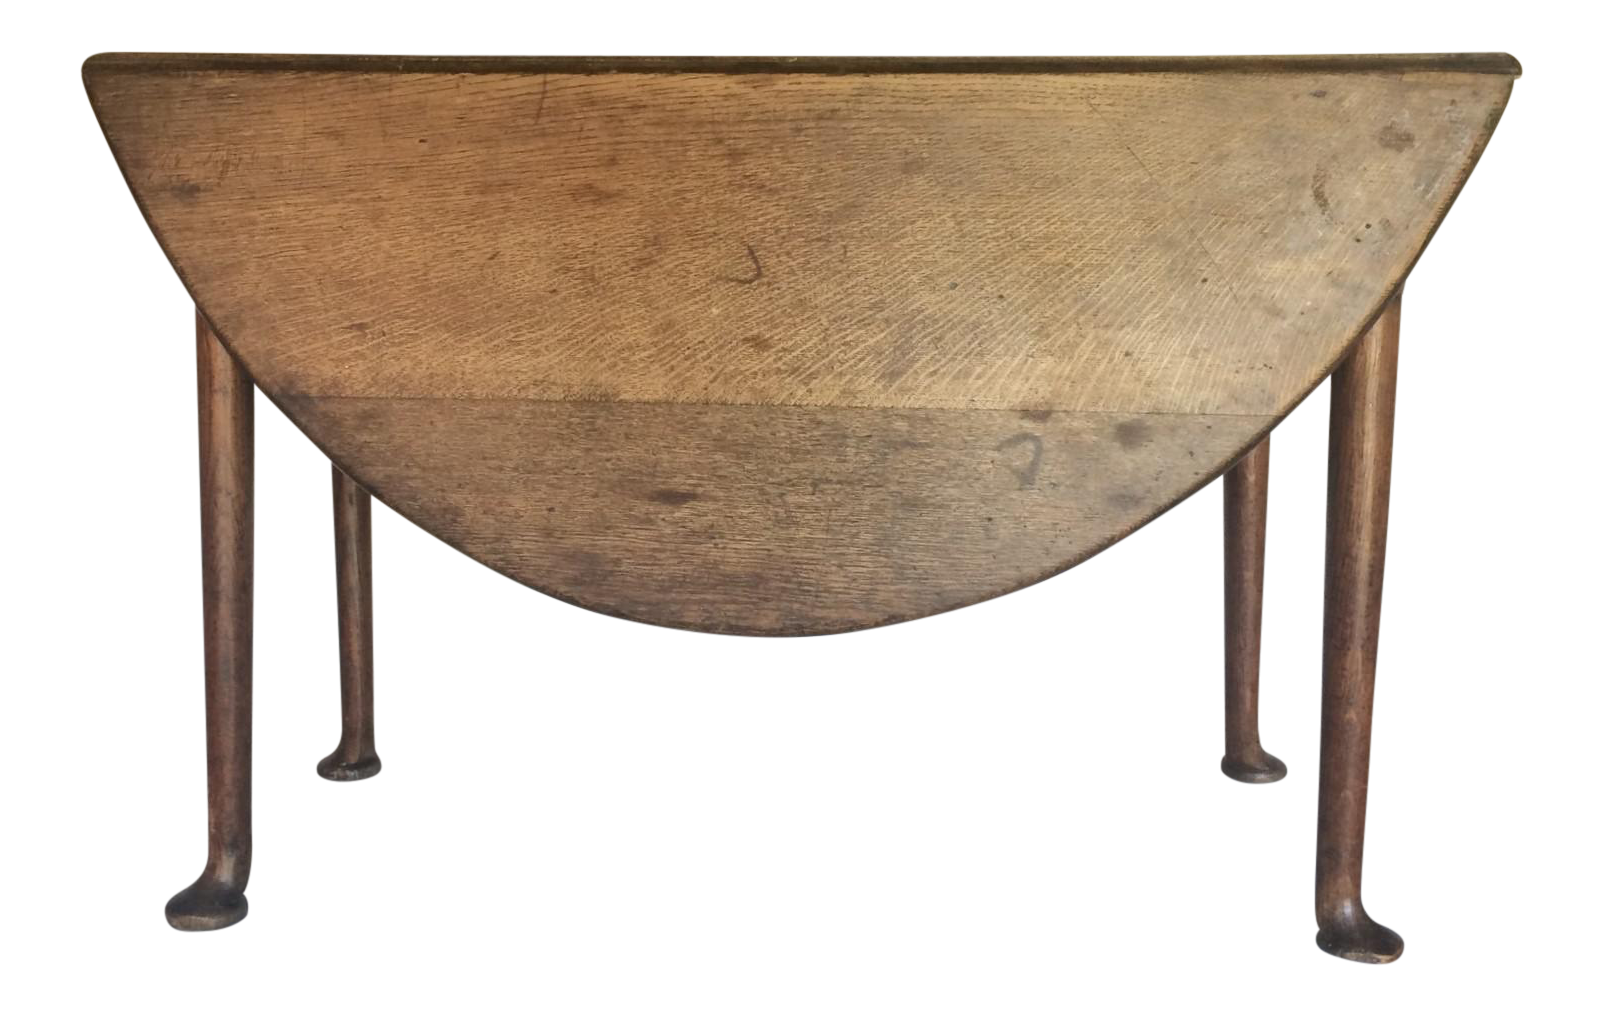 Antique 19th C. English Oak Drop Leaf Gate Leg Table